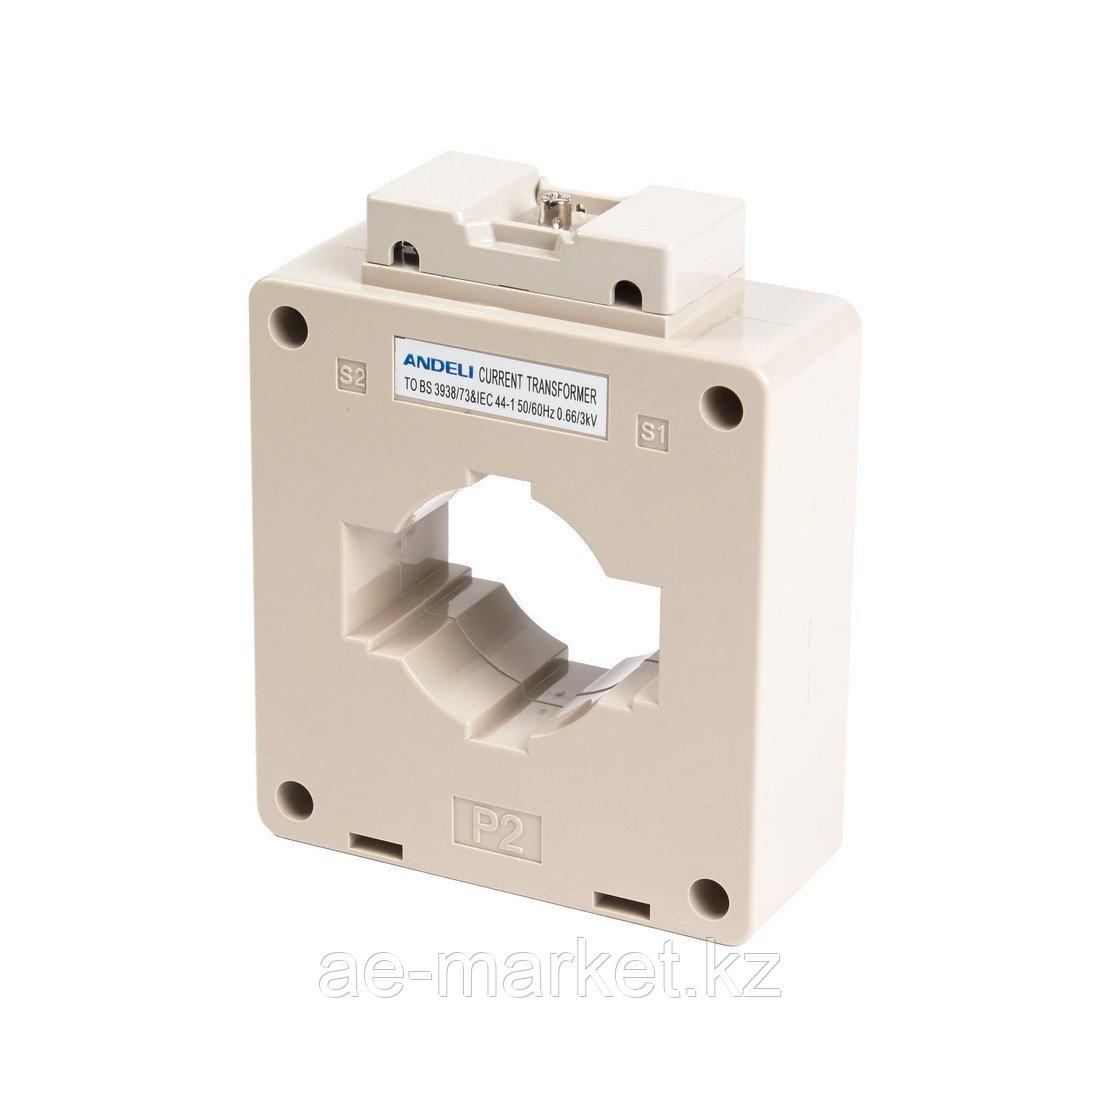 Трансформатор тока ANDELI MSQ-60 400/5